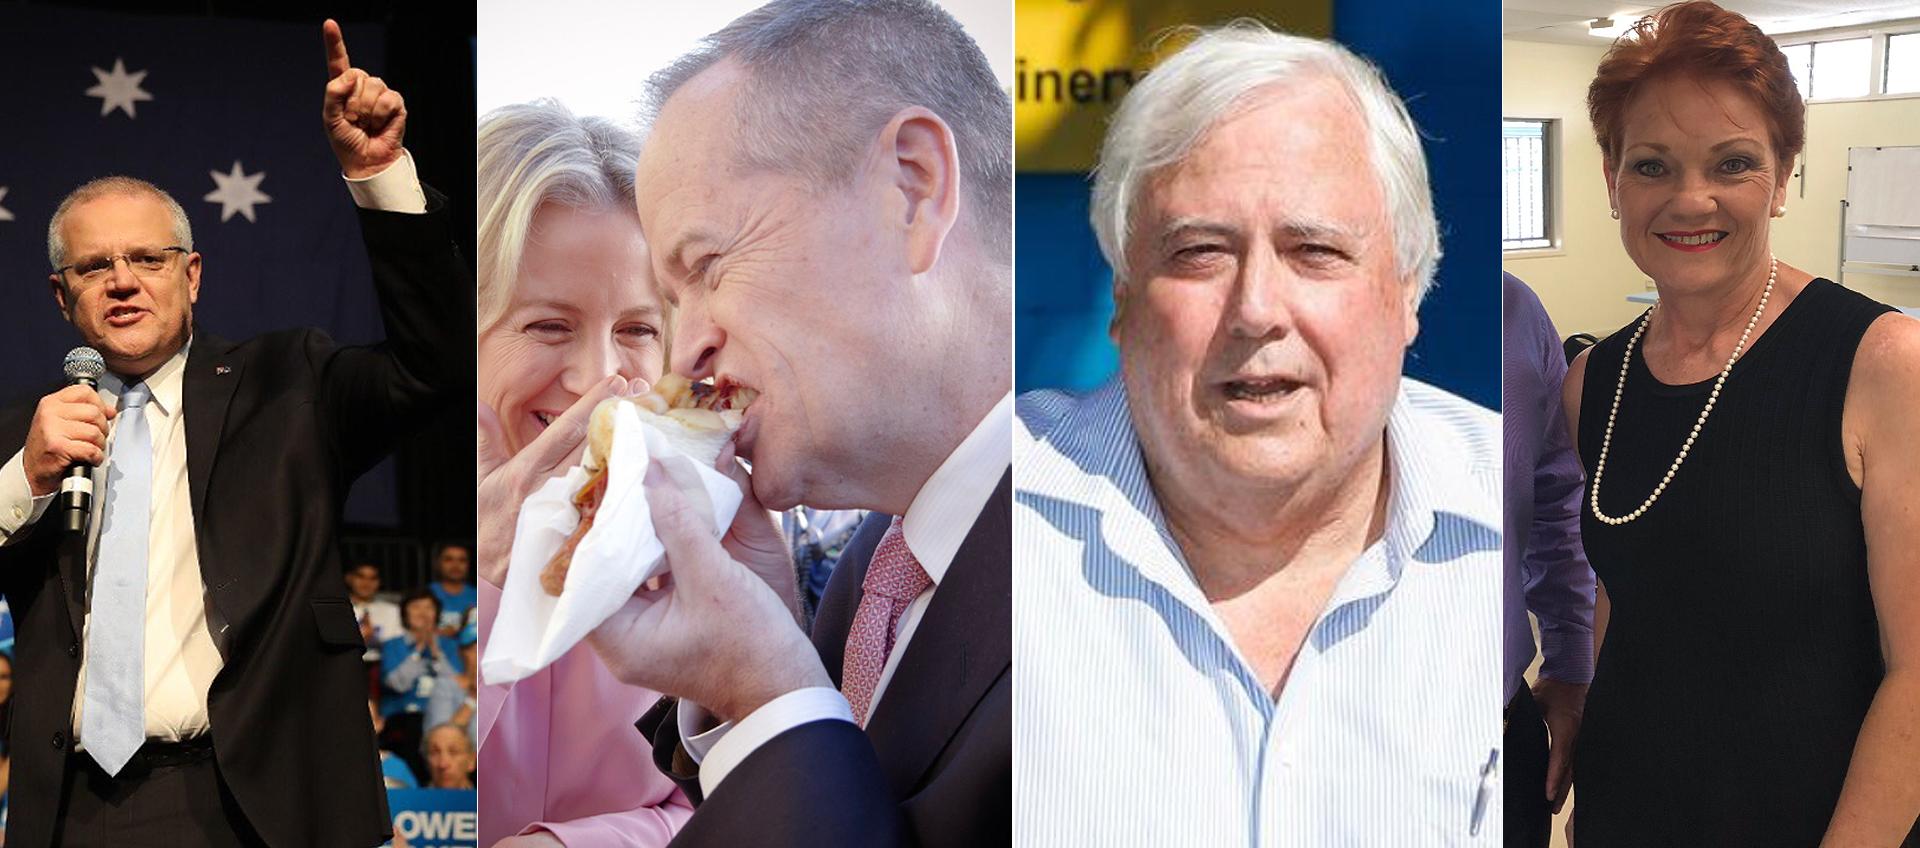 Prime Minister Scott Morrision, Bill Shorten, Clive Palmer and Pauline Hanson.